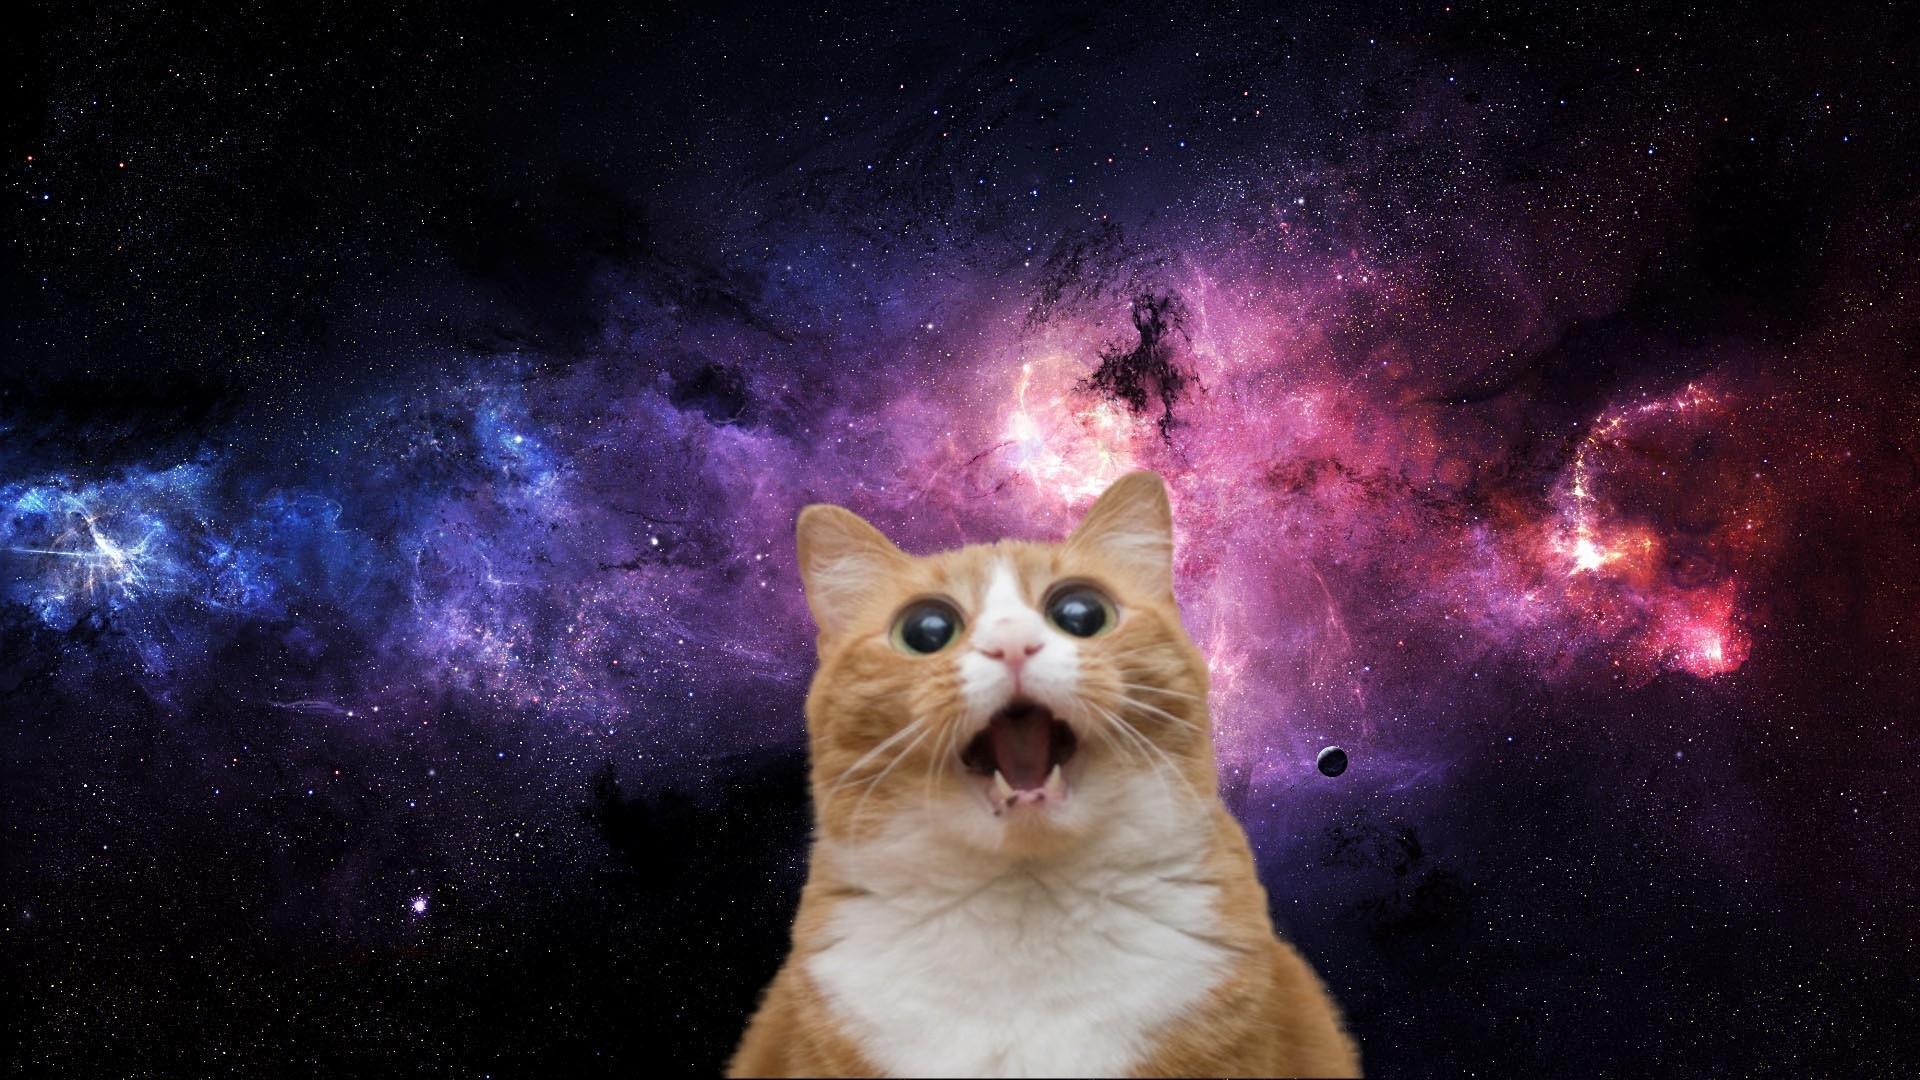 1920x1200 Funny Space Cat Wallpaper HD Ts0 Px 71719 KB Cute